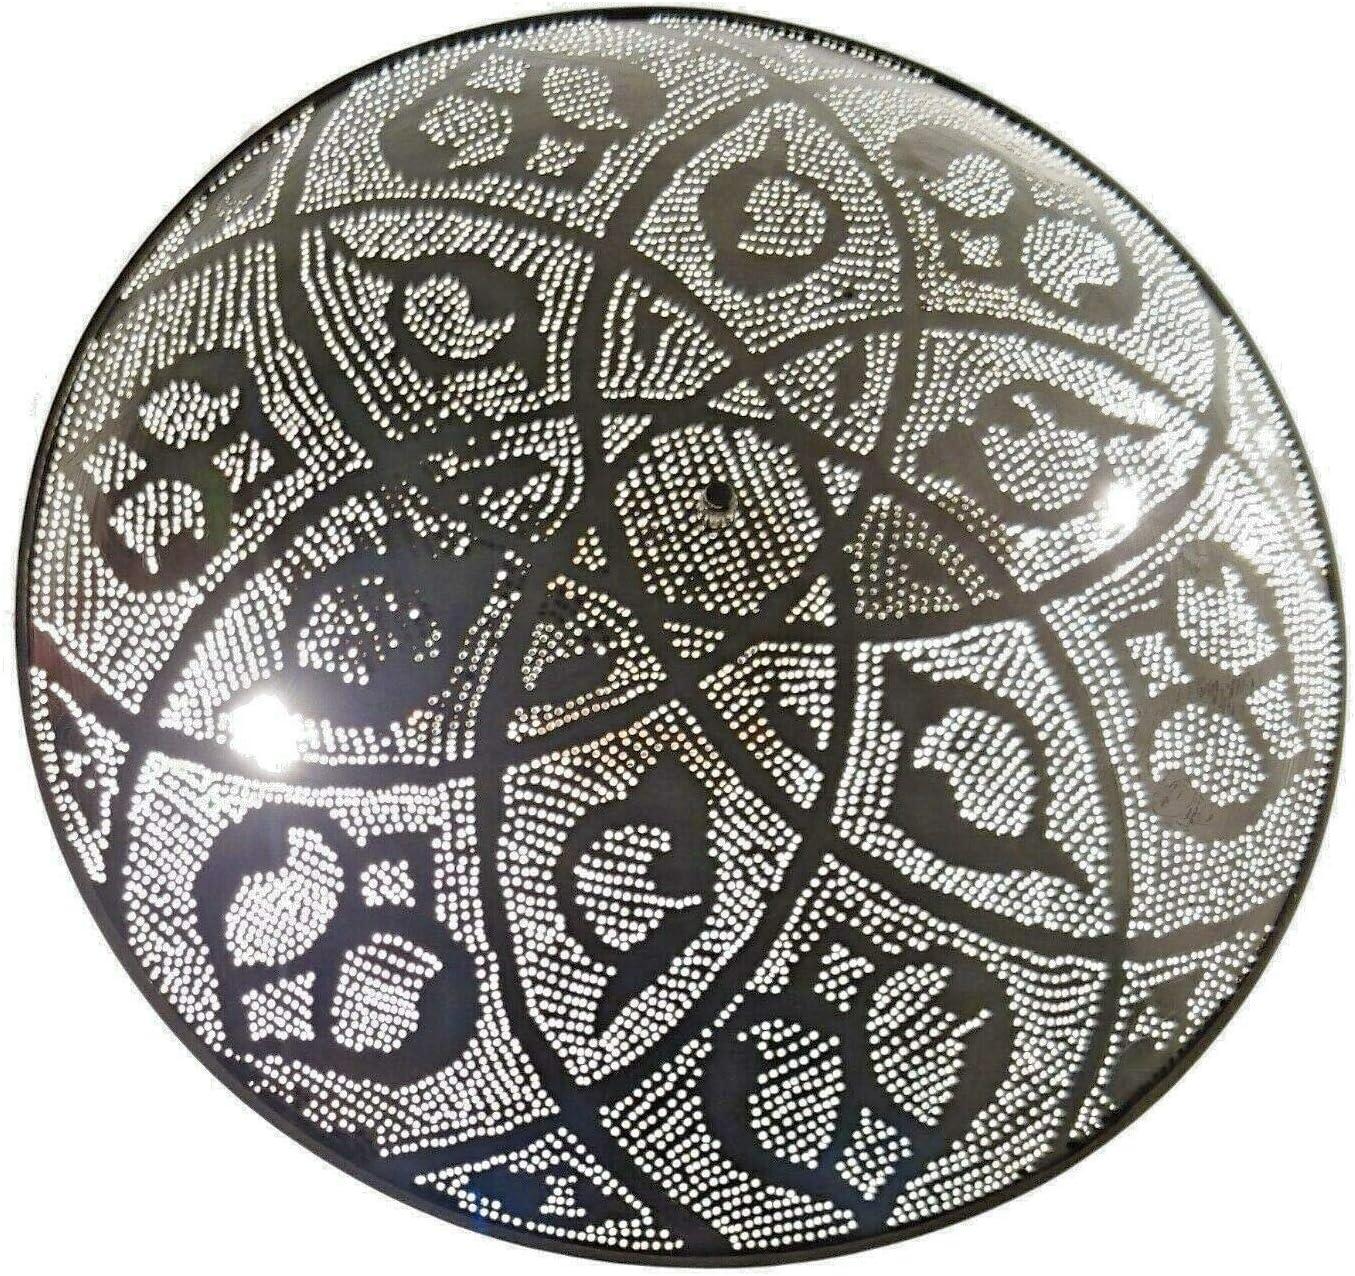 Bm16 Circle Round Tin Moroccan Silver Flush Mount Ceiling Light Fixture Led Lamp Amazon Com